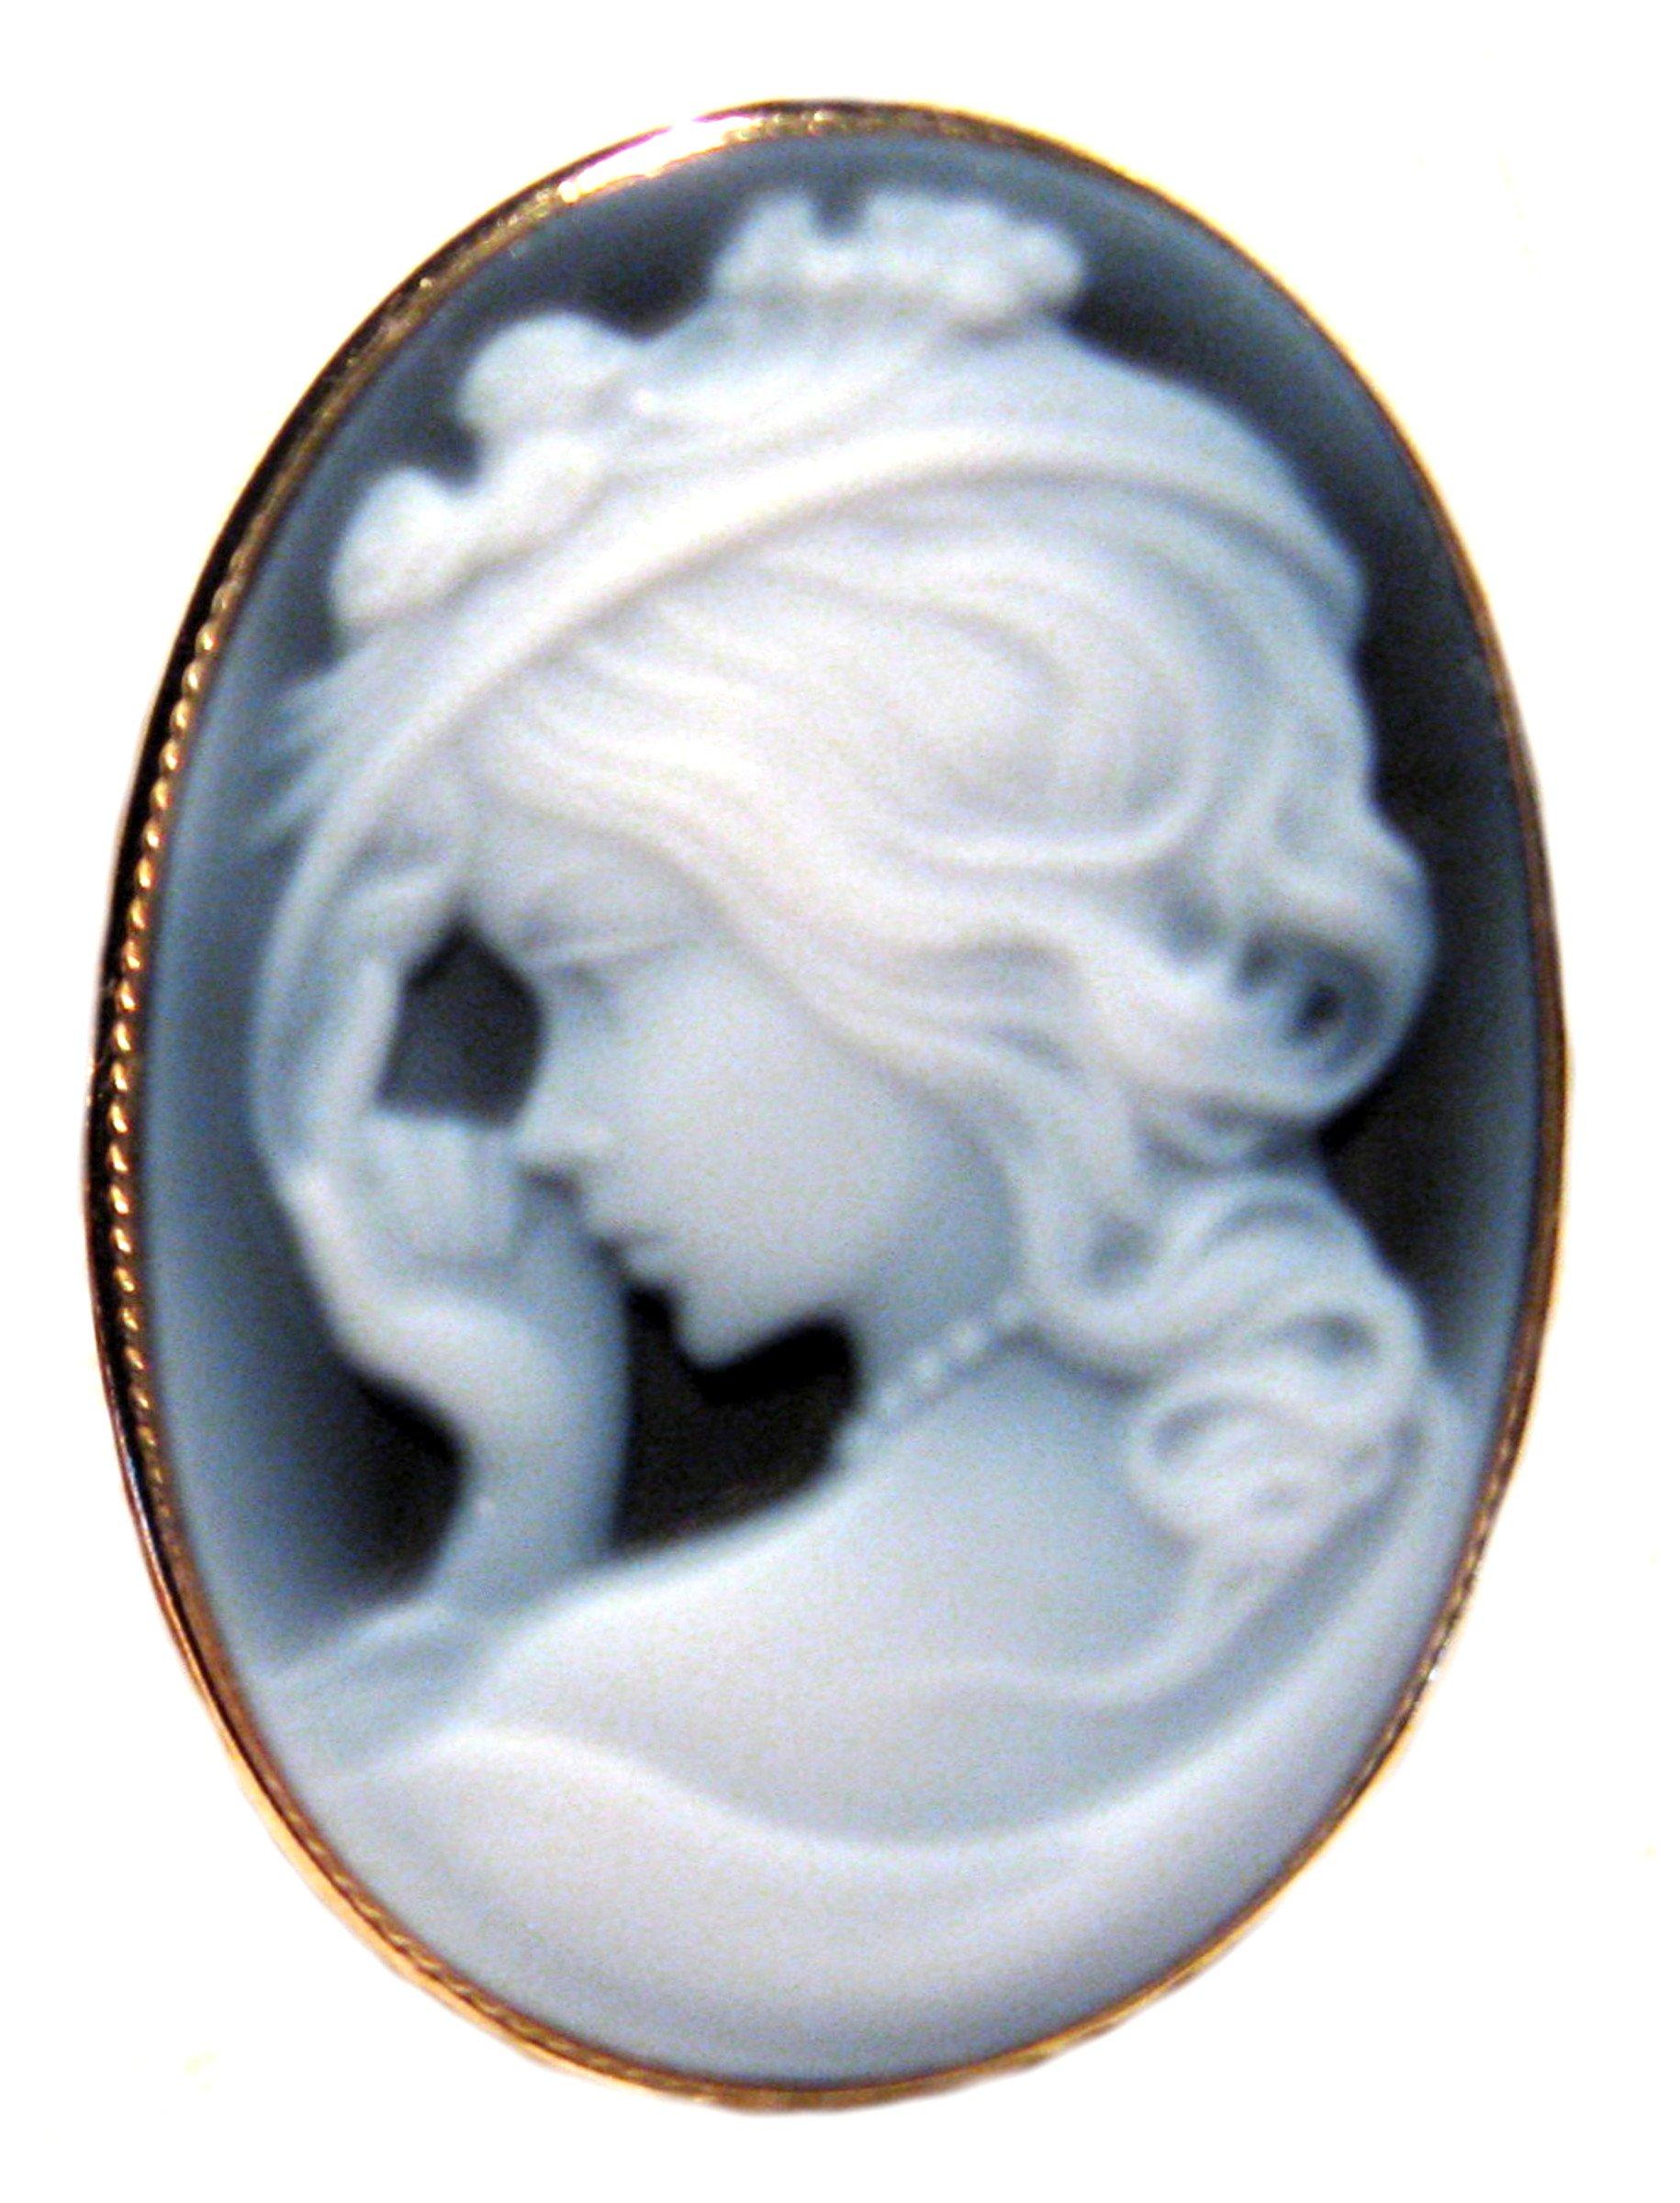 Summer Dream Cameo Broach Pendant Enhancer Agate Stone Laser Carved Italian Sterling Silver 18k Overlay